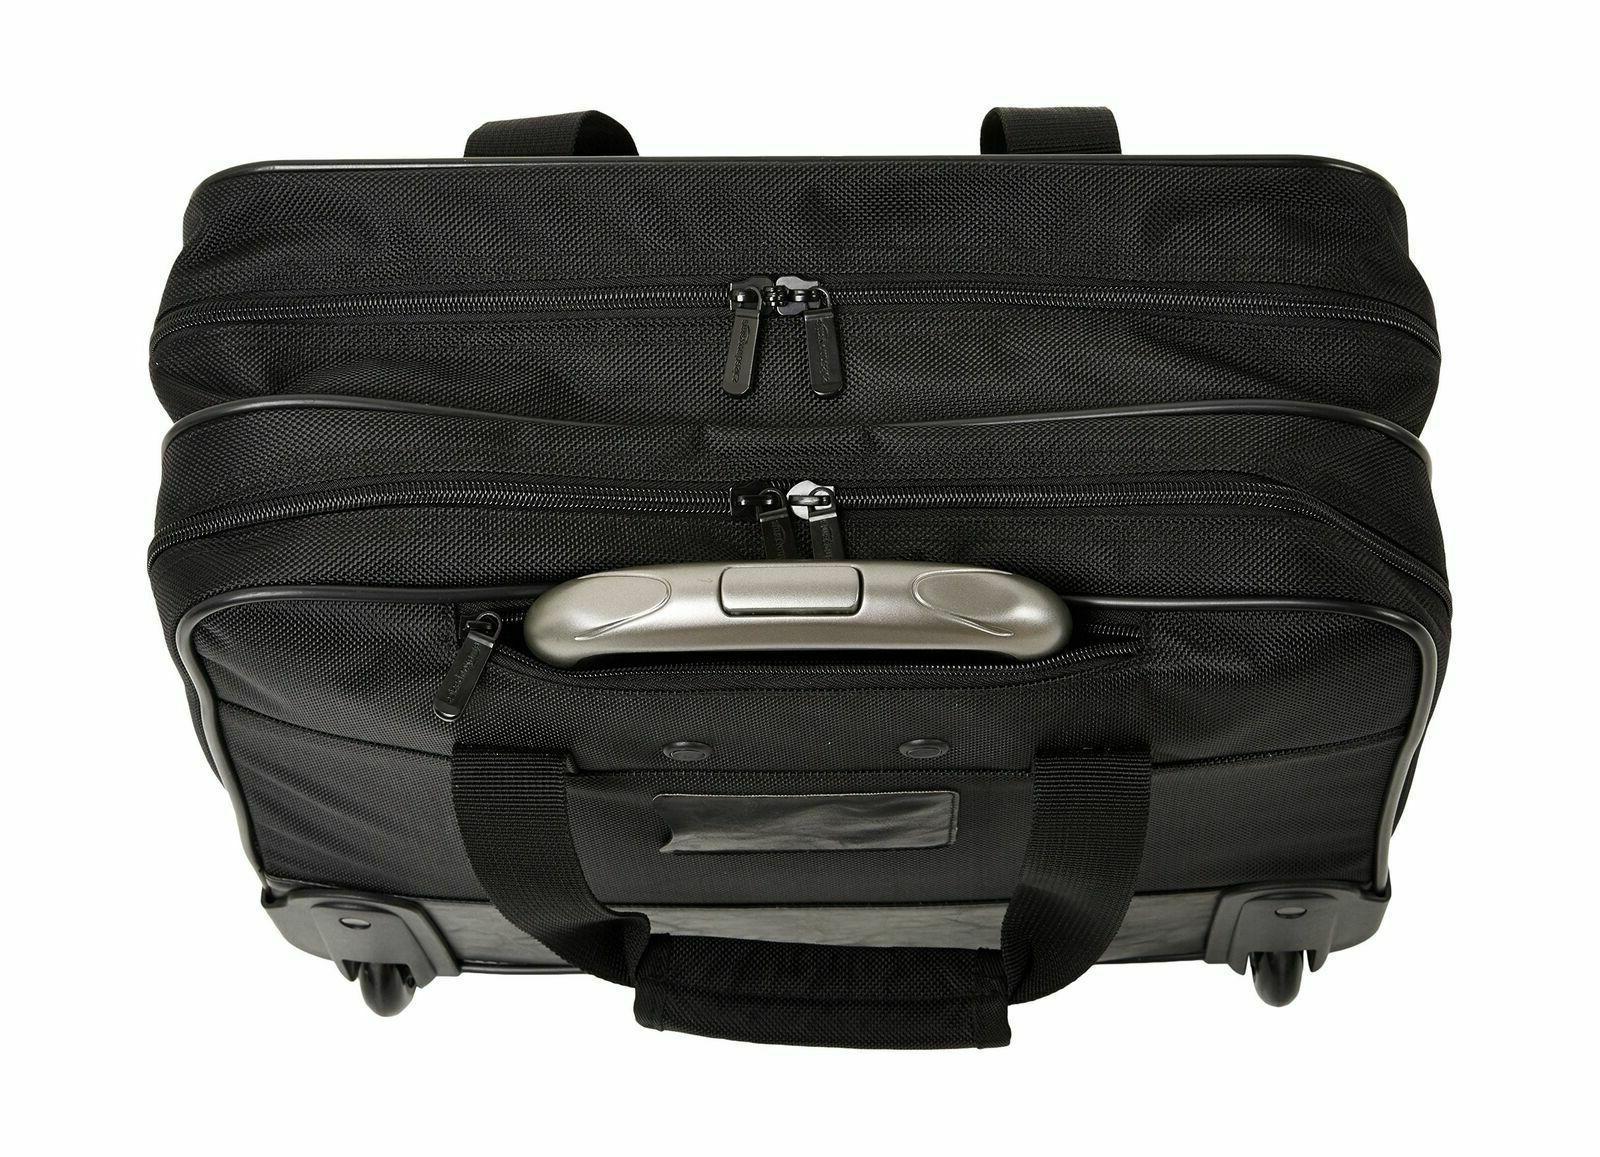 AmazonBasics Laptop Case Black